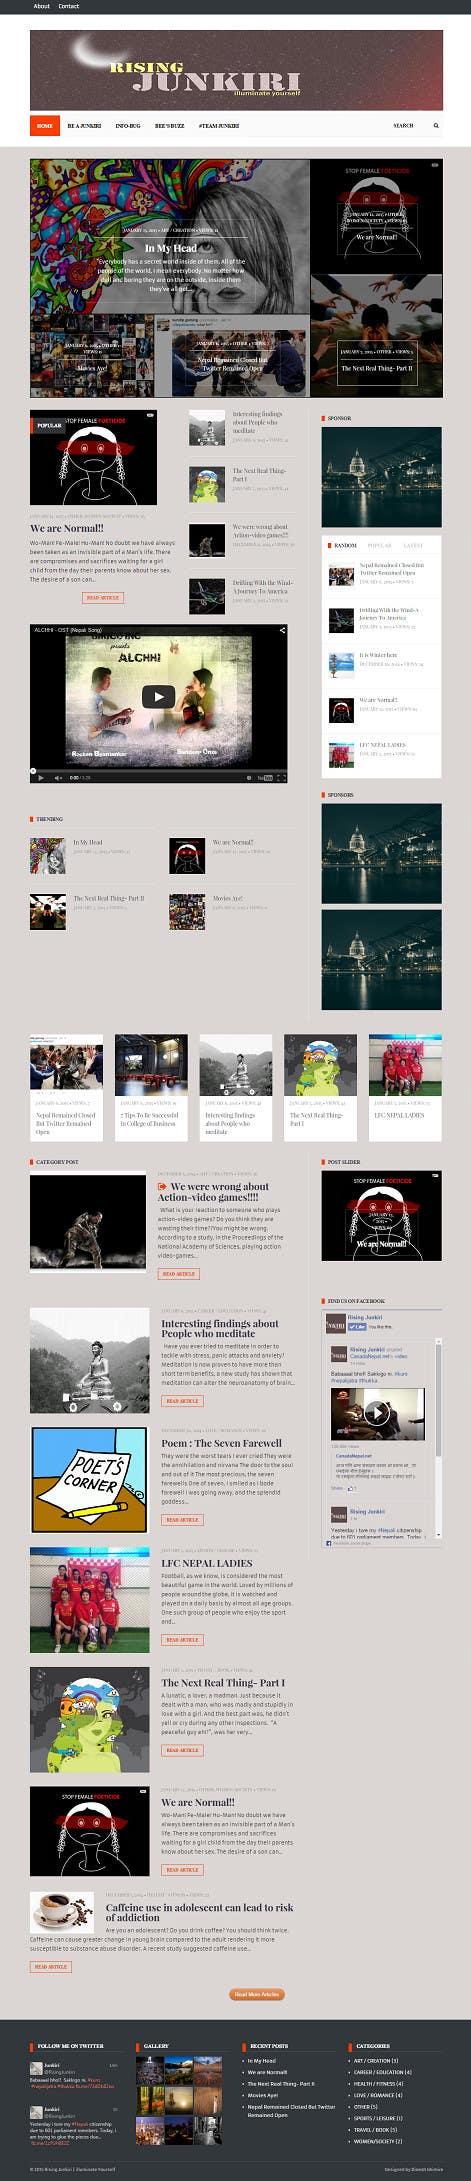 Konkurrenceindlæg #                                        17                                      for                                         Create Wordpress theme for B&B